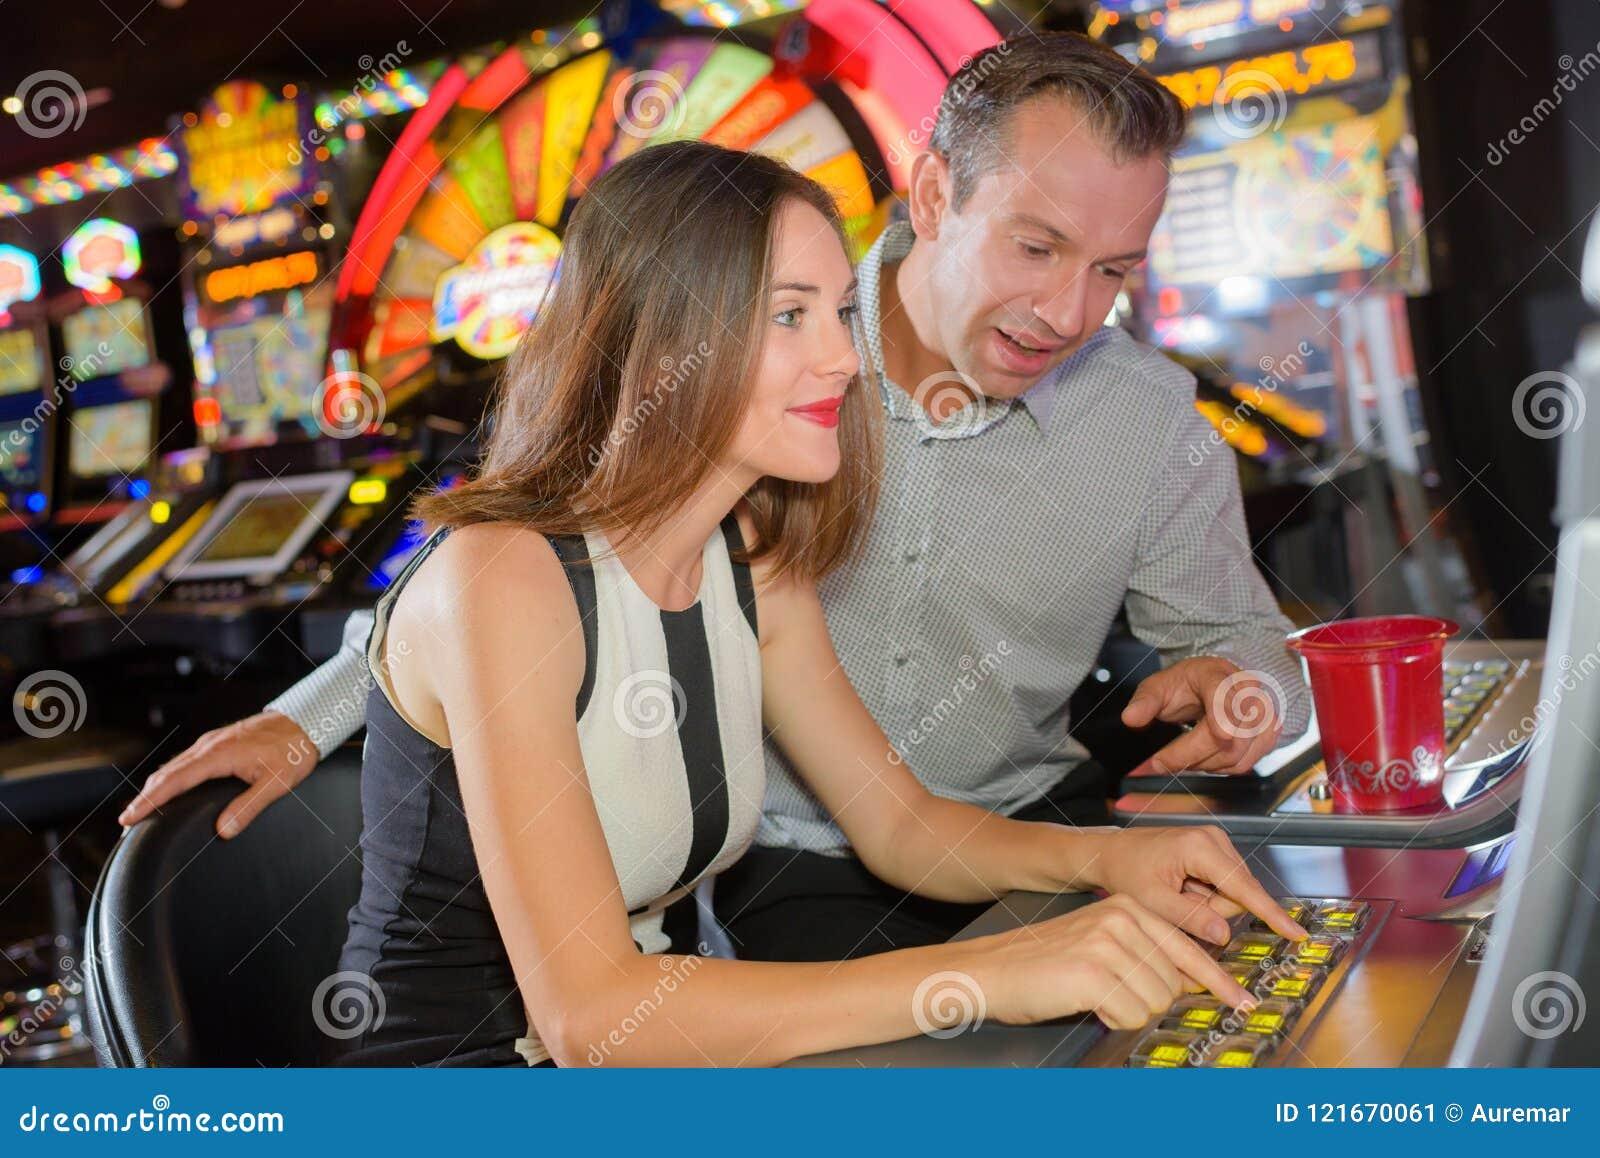 Slot Machines Addiction